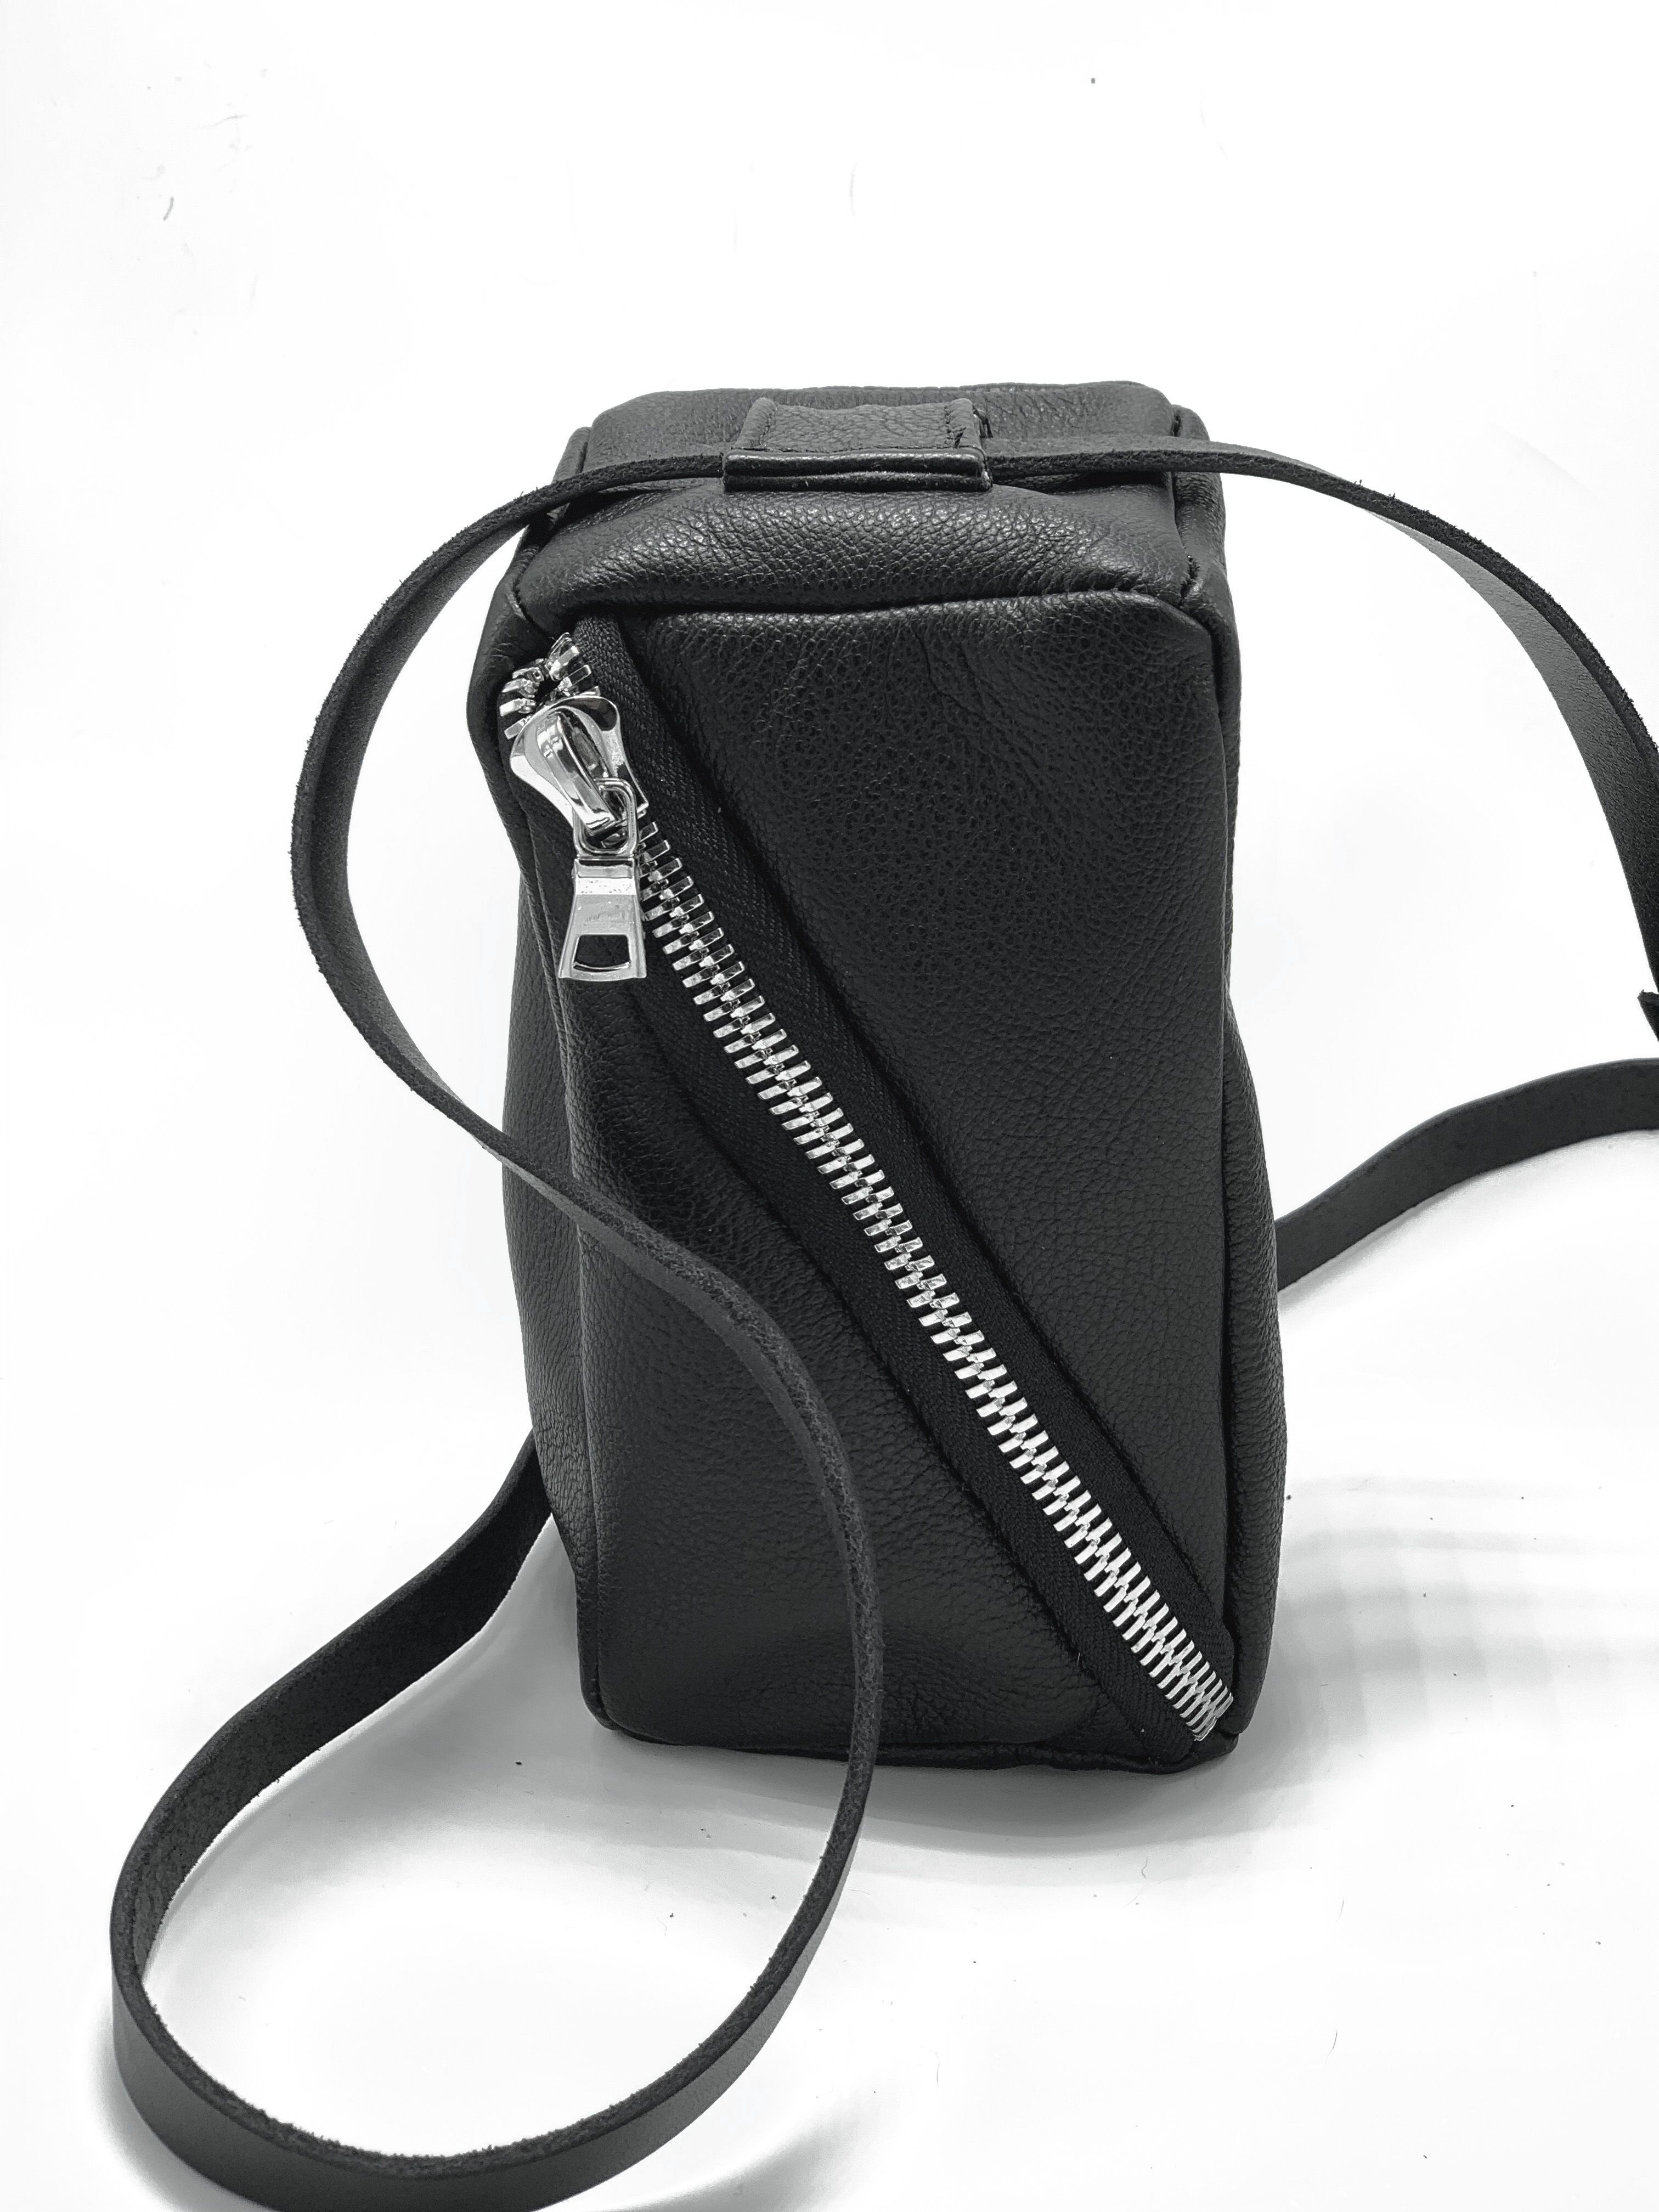 Black Galaxy Handbag Crossbody Bags For Women Sling Shoulder Messenger